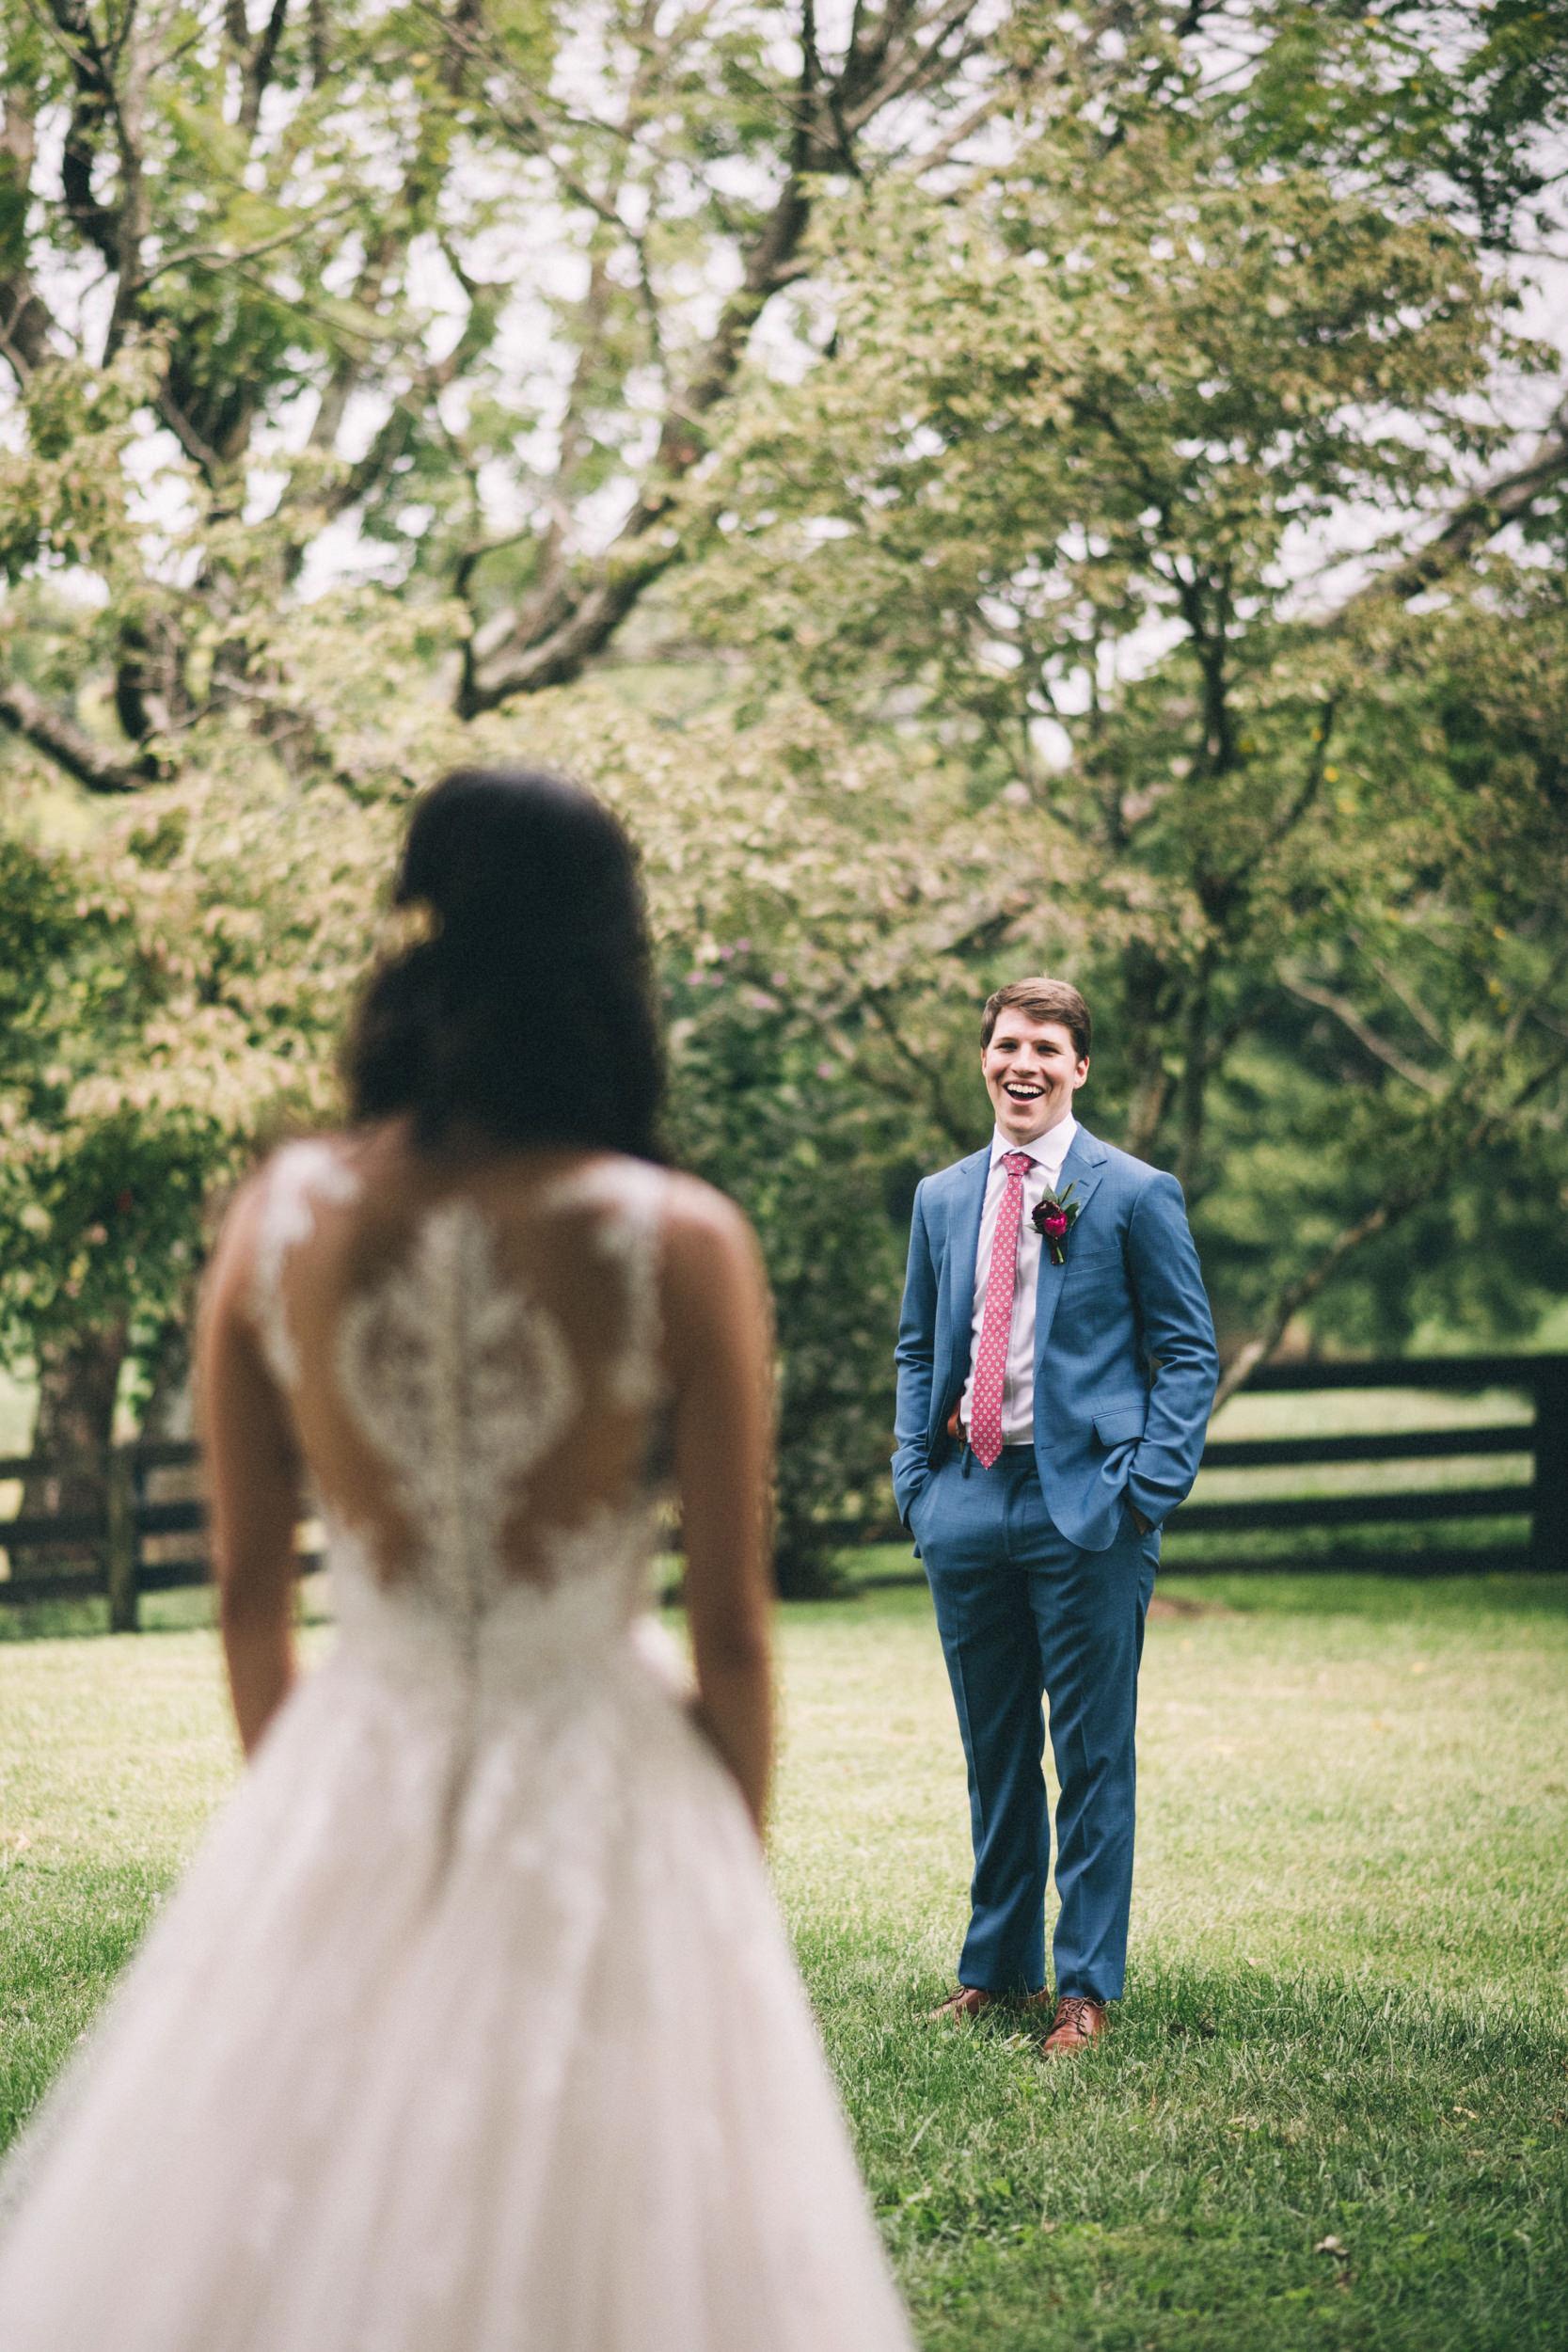 Louisville-Kentucky-Wedding-and-Elopement-Photographer-Sarah-Katherine-Davis-Photography-Summer-Jewel-Toned-Wedding-Chineese-Tea-Ceremony-Warrenwood-Manor-Danville-164.jpg